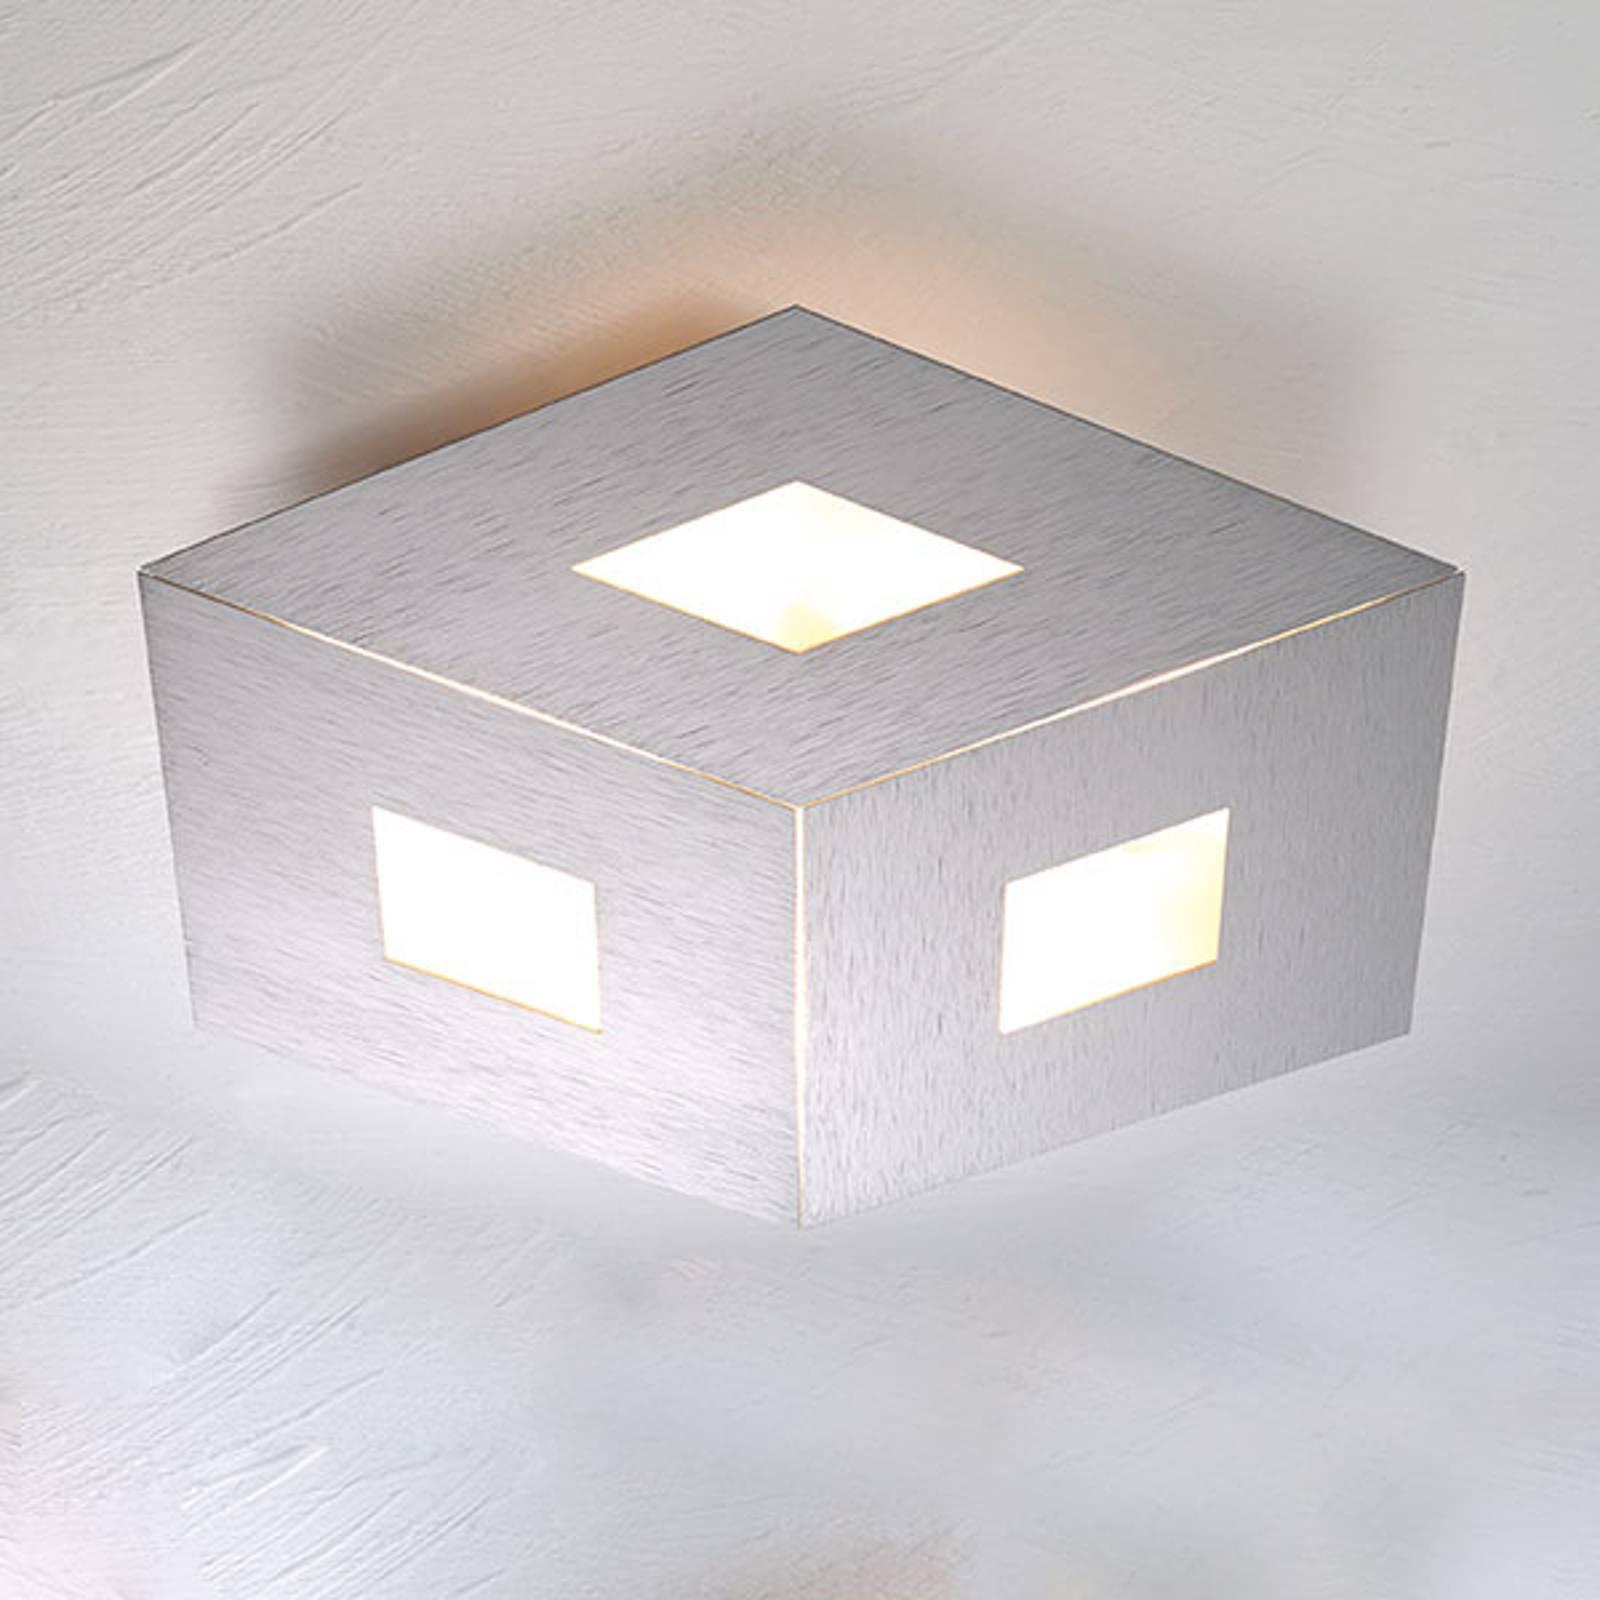 Bopp box Comfort LED plafondlamp zilver 45cm